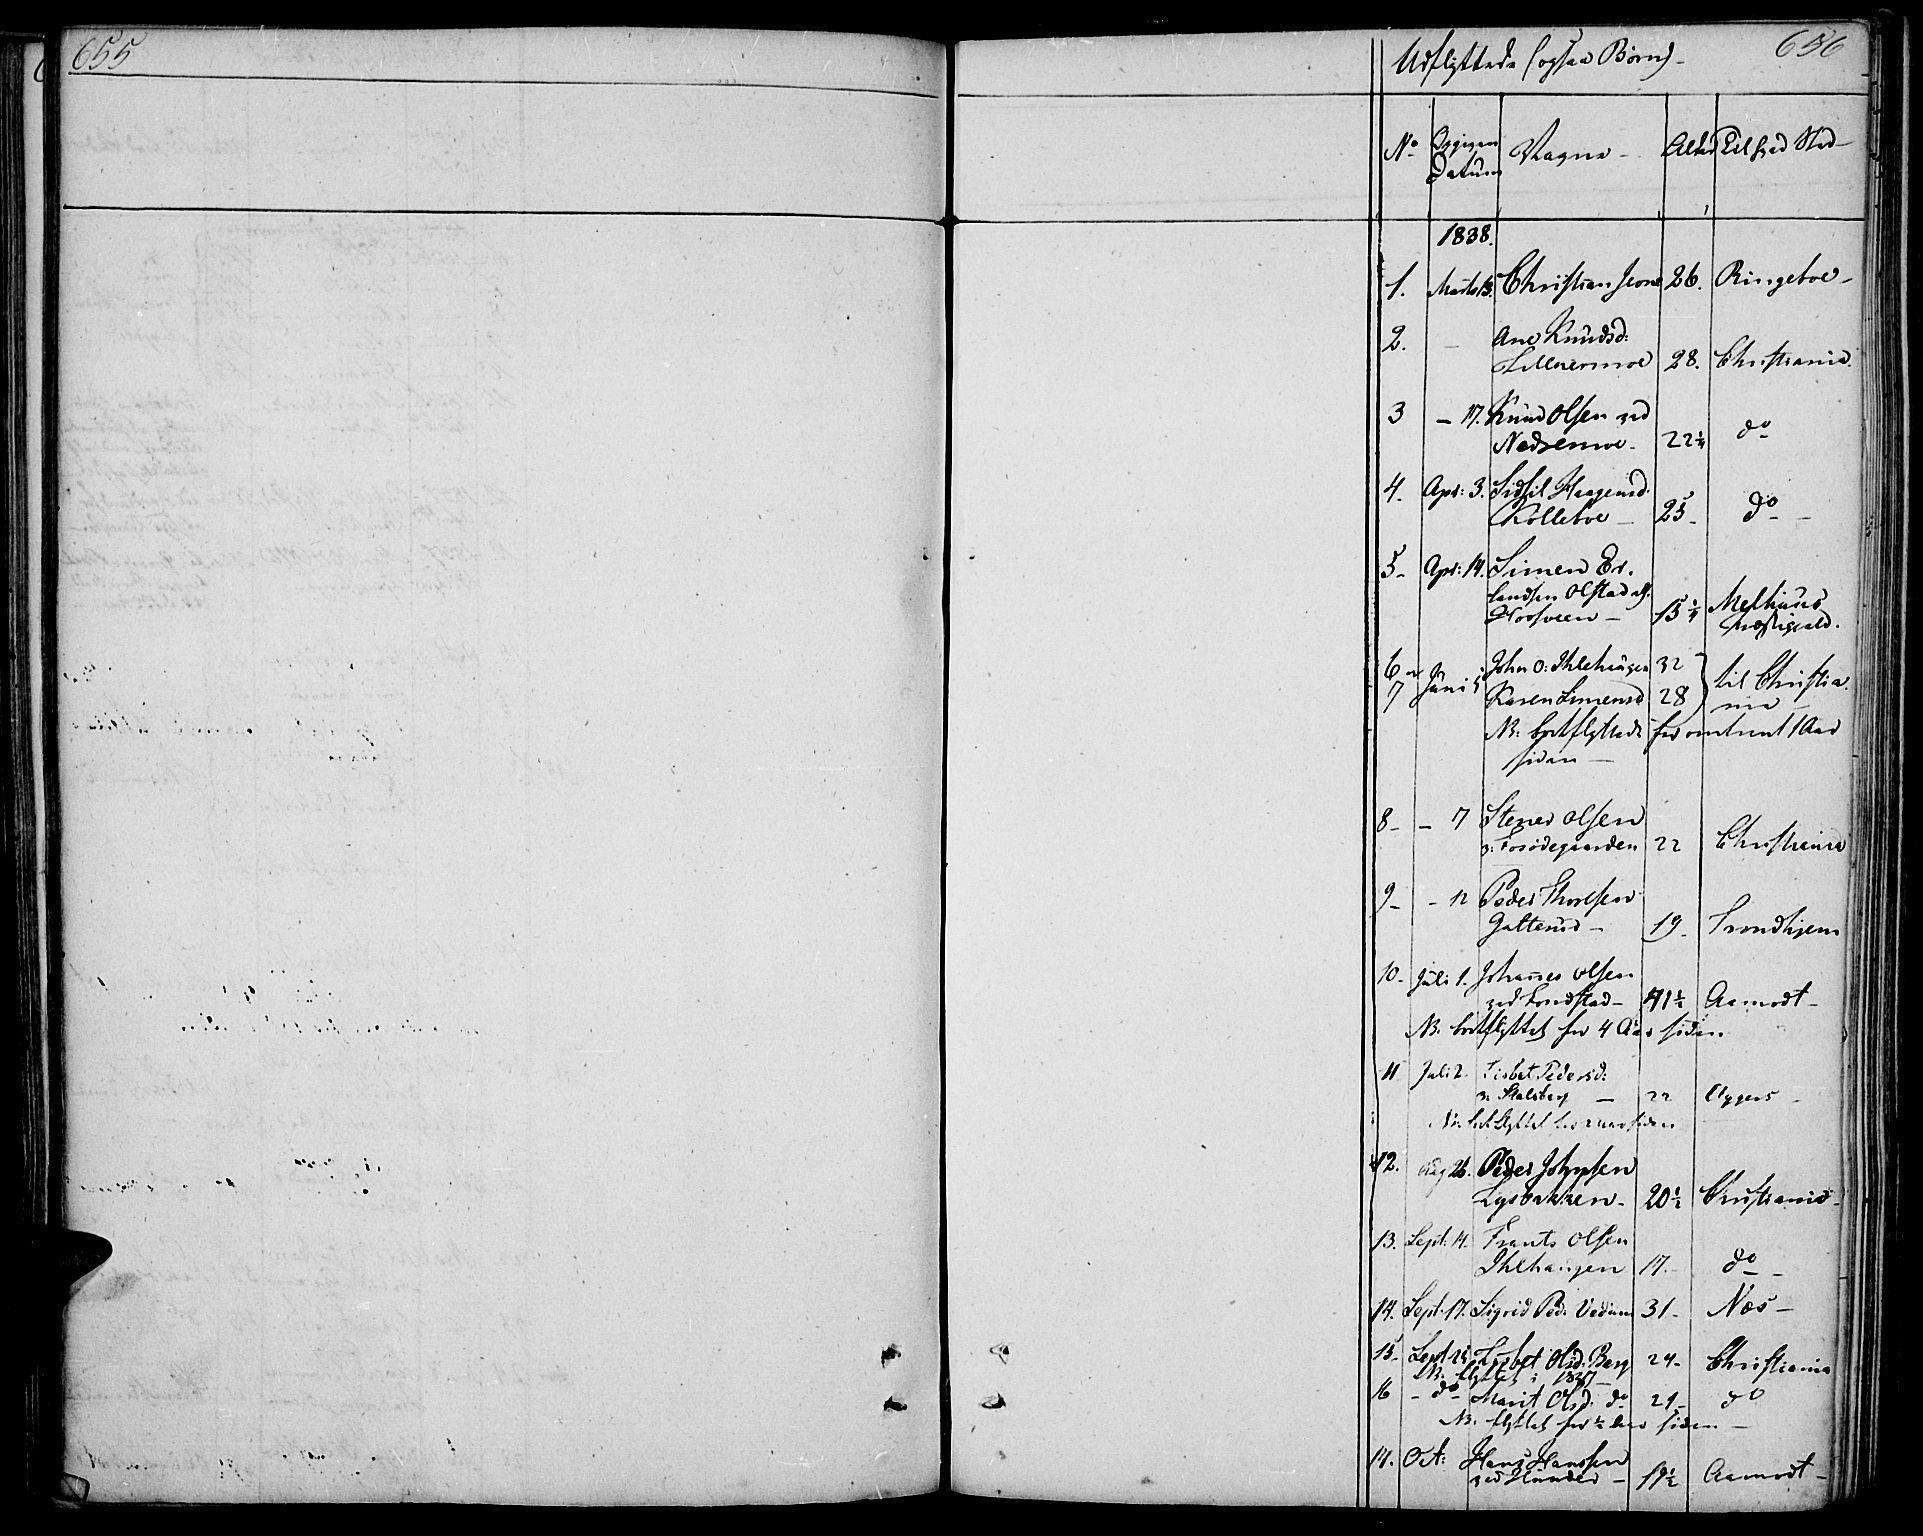 SAH, Øyer prestekontor, Ministerialbok nr. 4, 1824-1841, s. 655-656